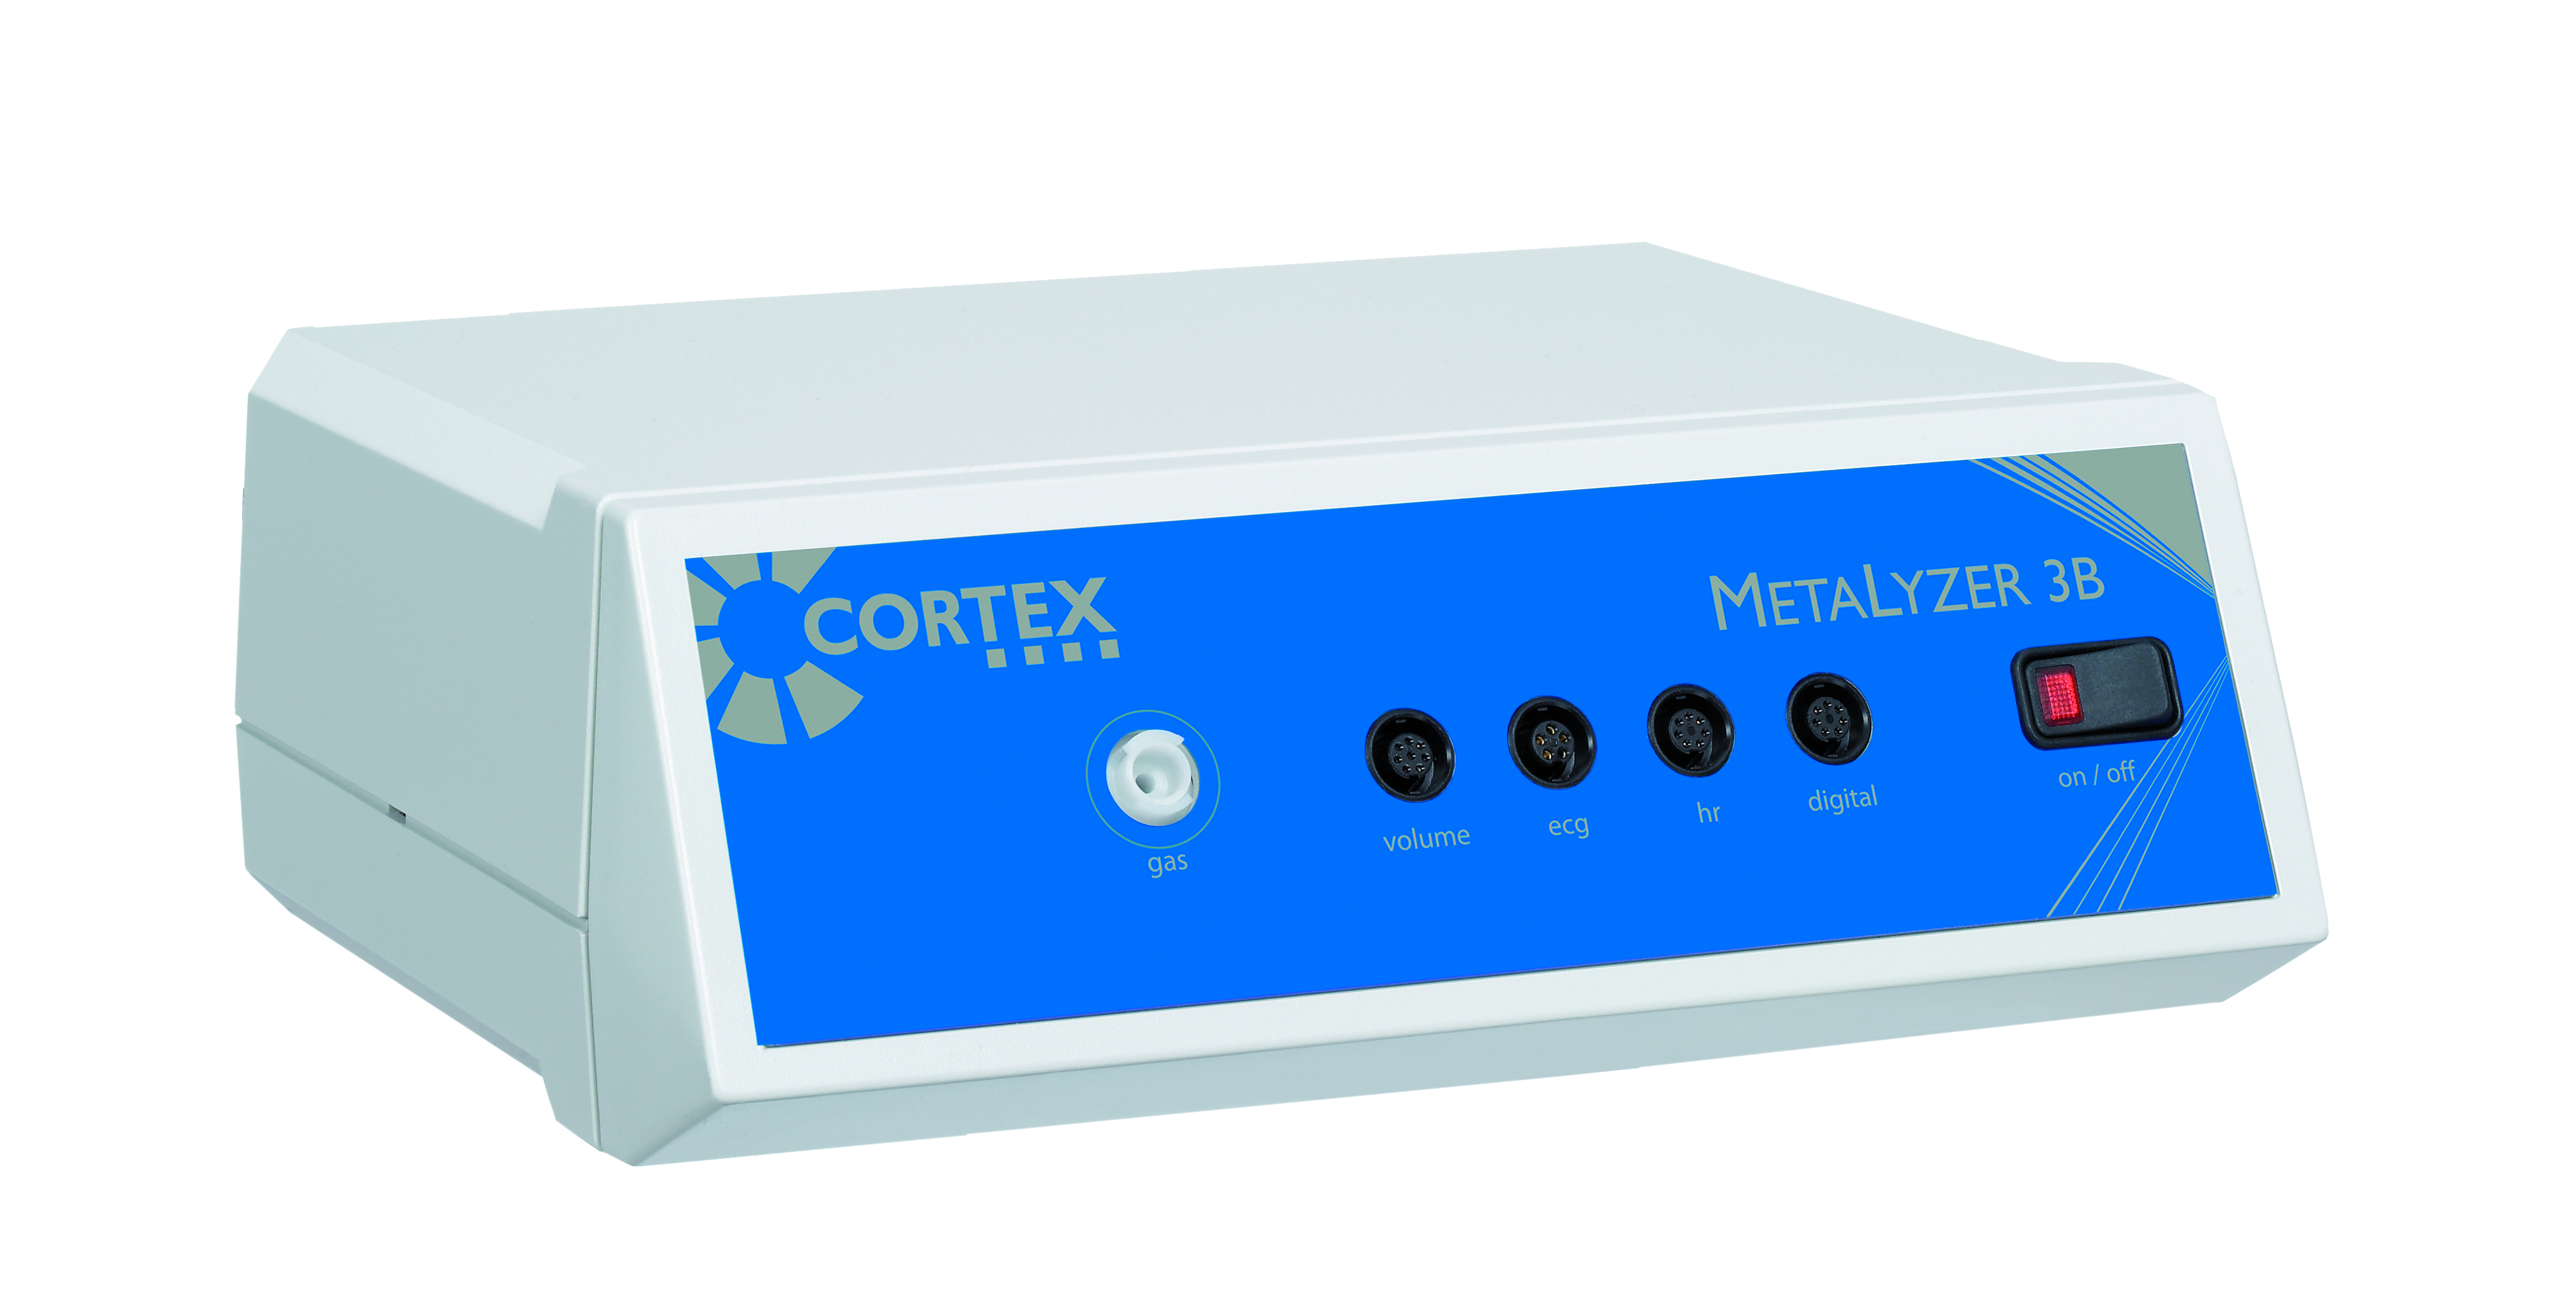 Metalyzer 3B Cortex Calorimetría Indirecta